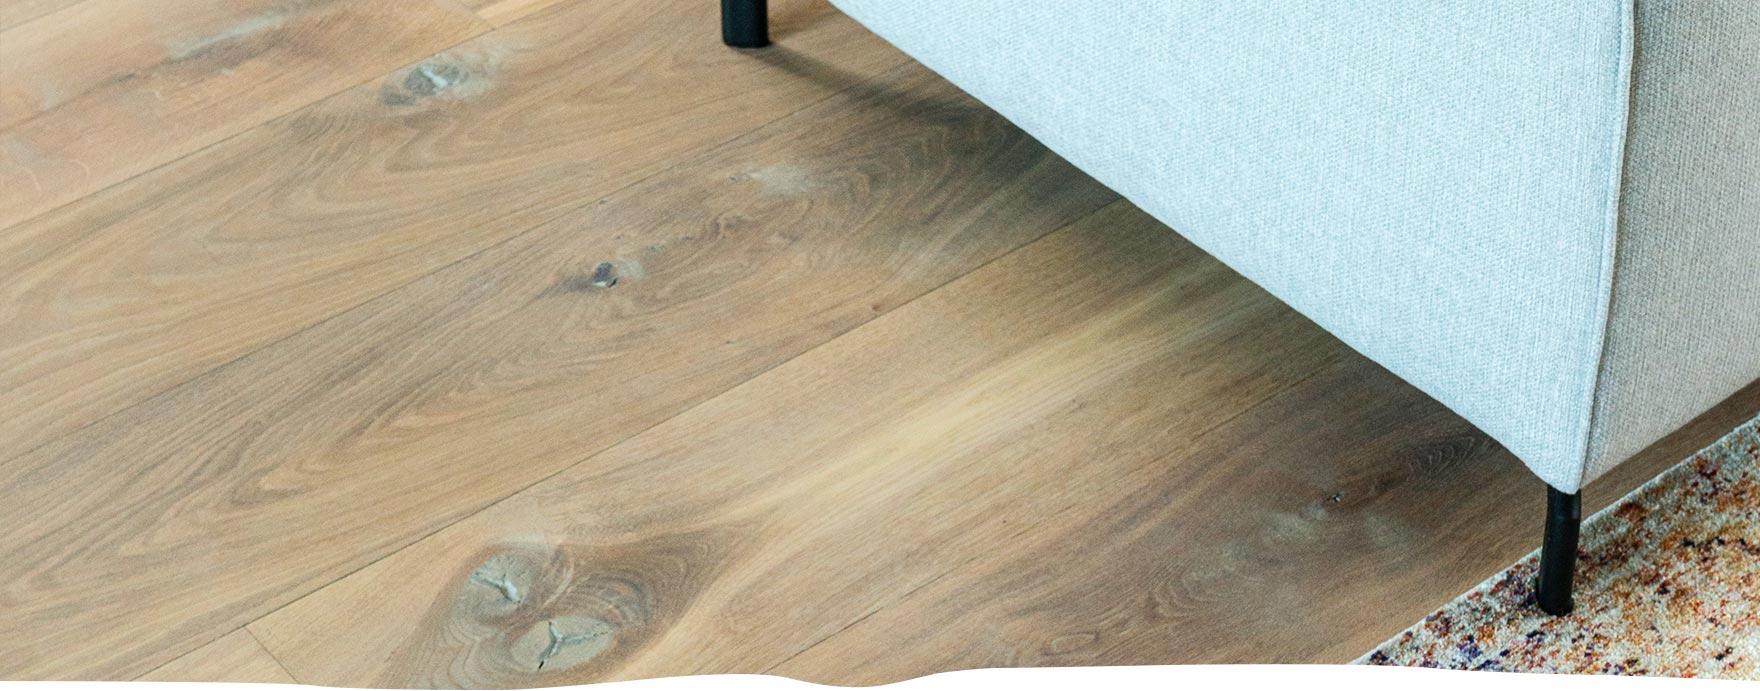 Rustieke duoplank vloer met vloerverwarming - De Hout Snip